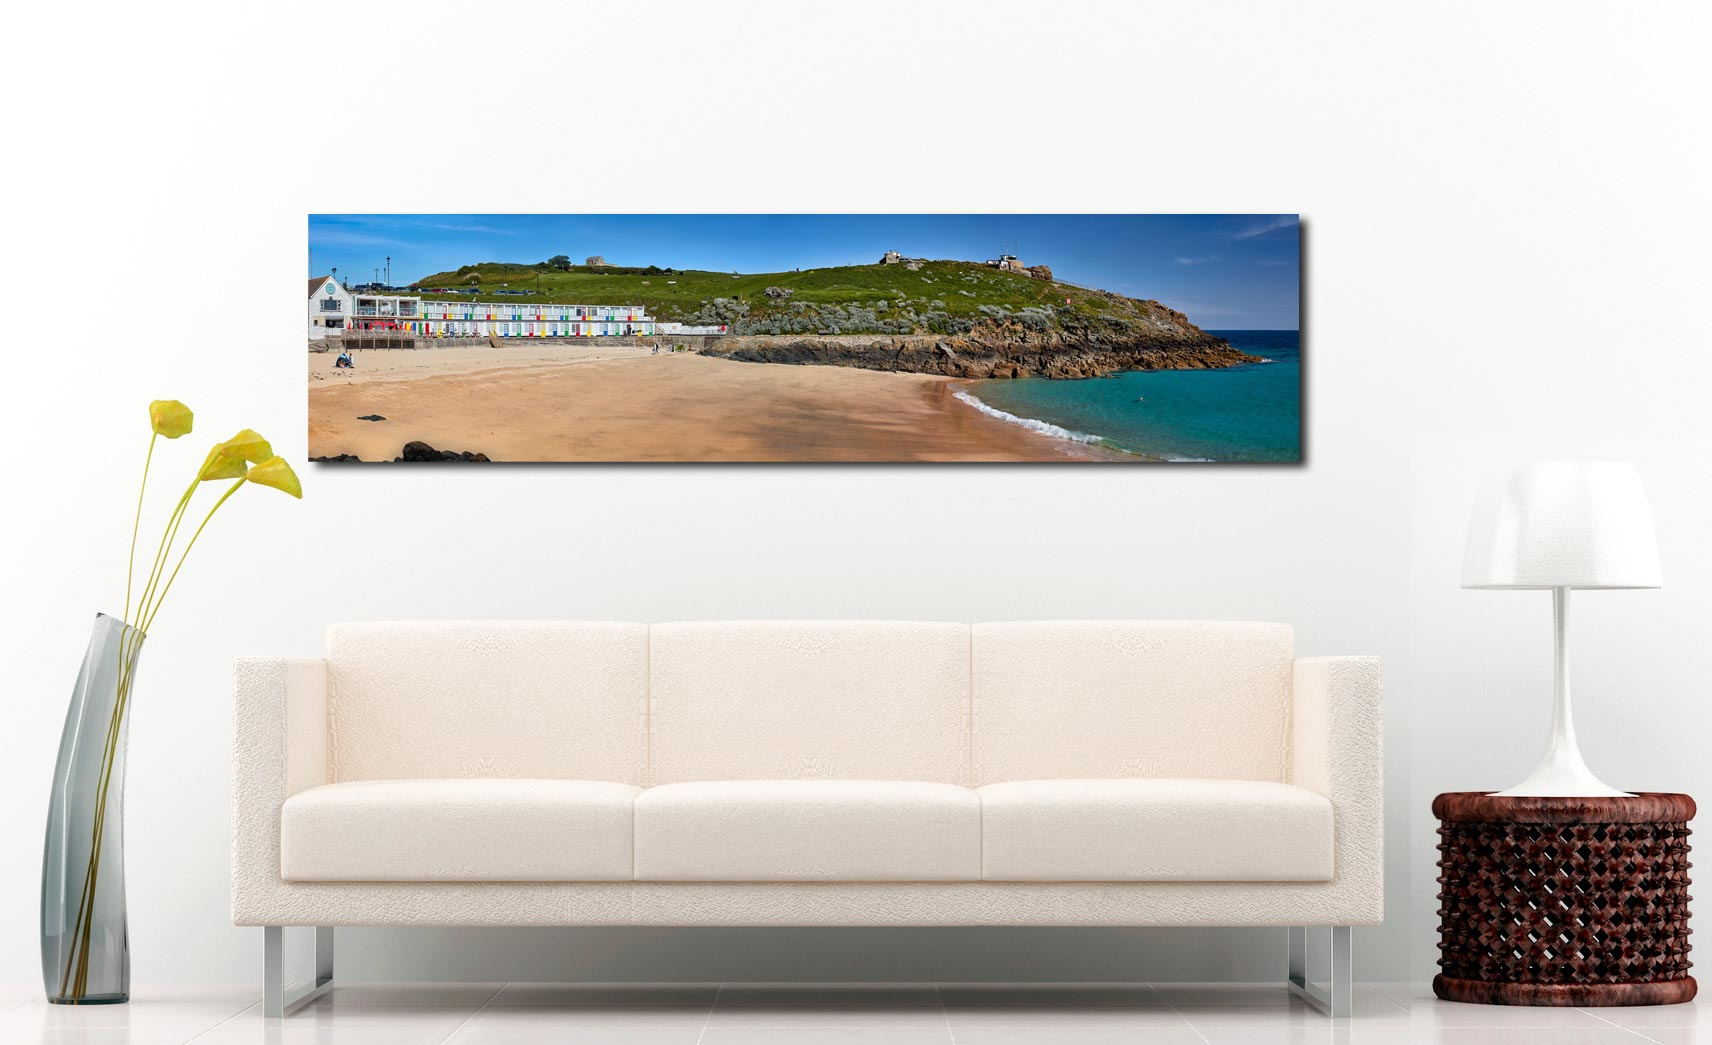 Porthgwidden Beach and The Island - Print Aluminium Backing With Acrylic Glazing on Wall